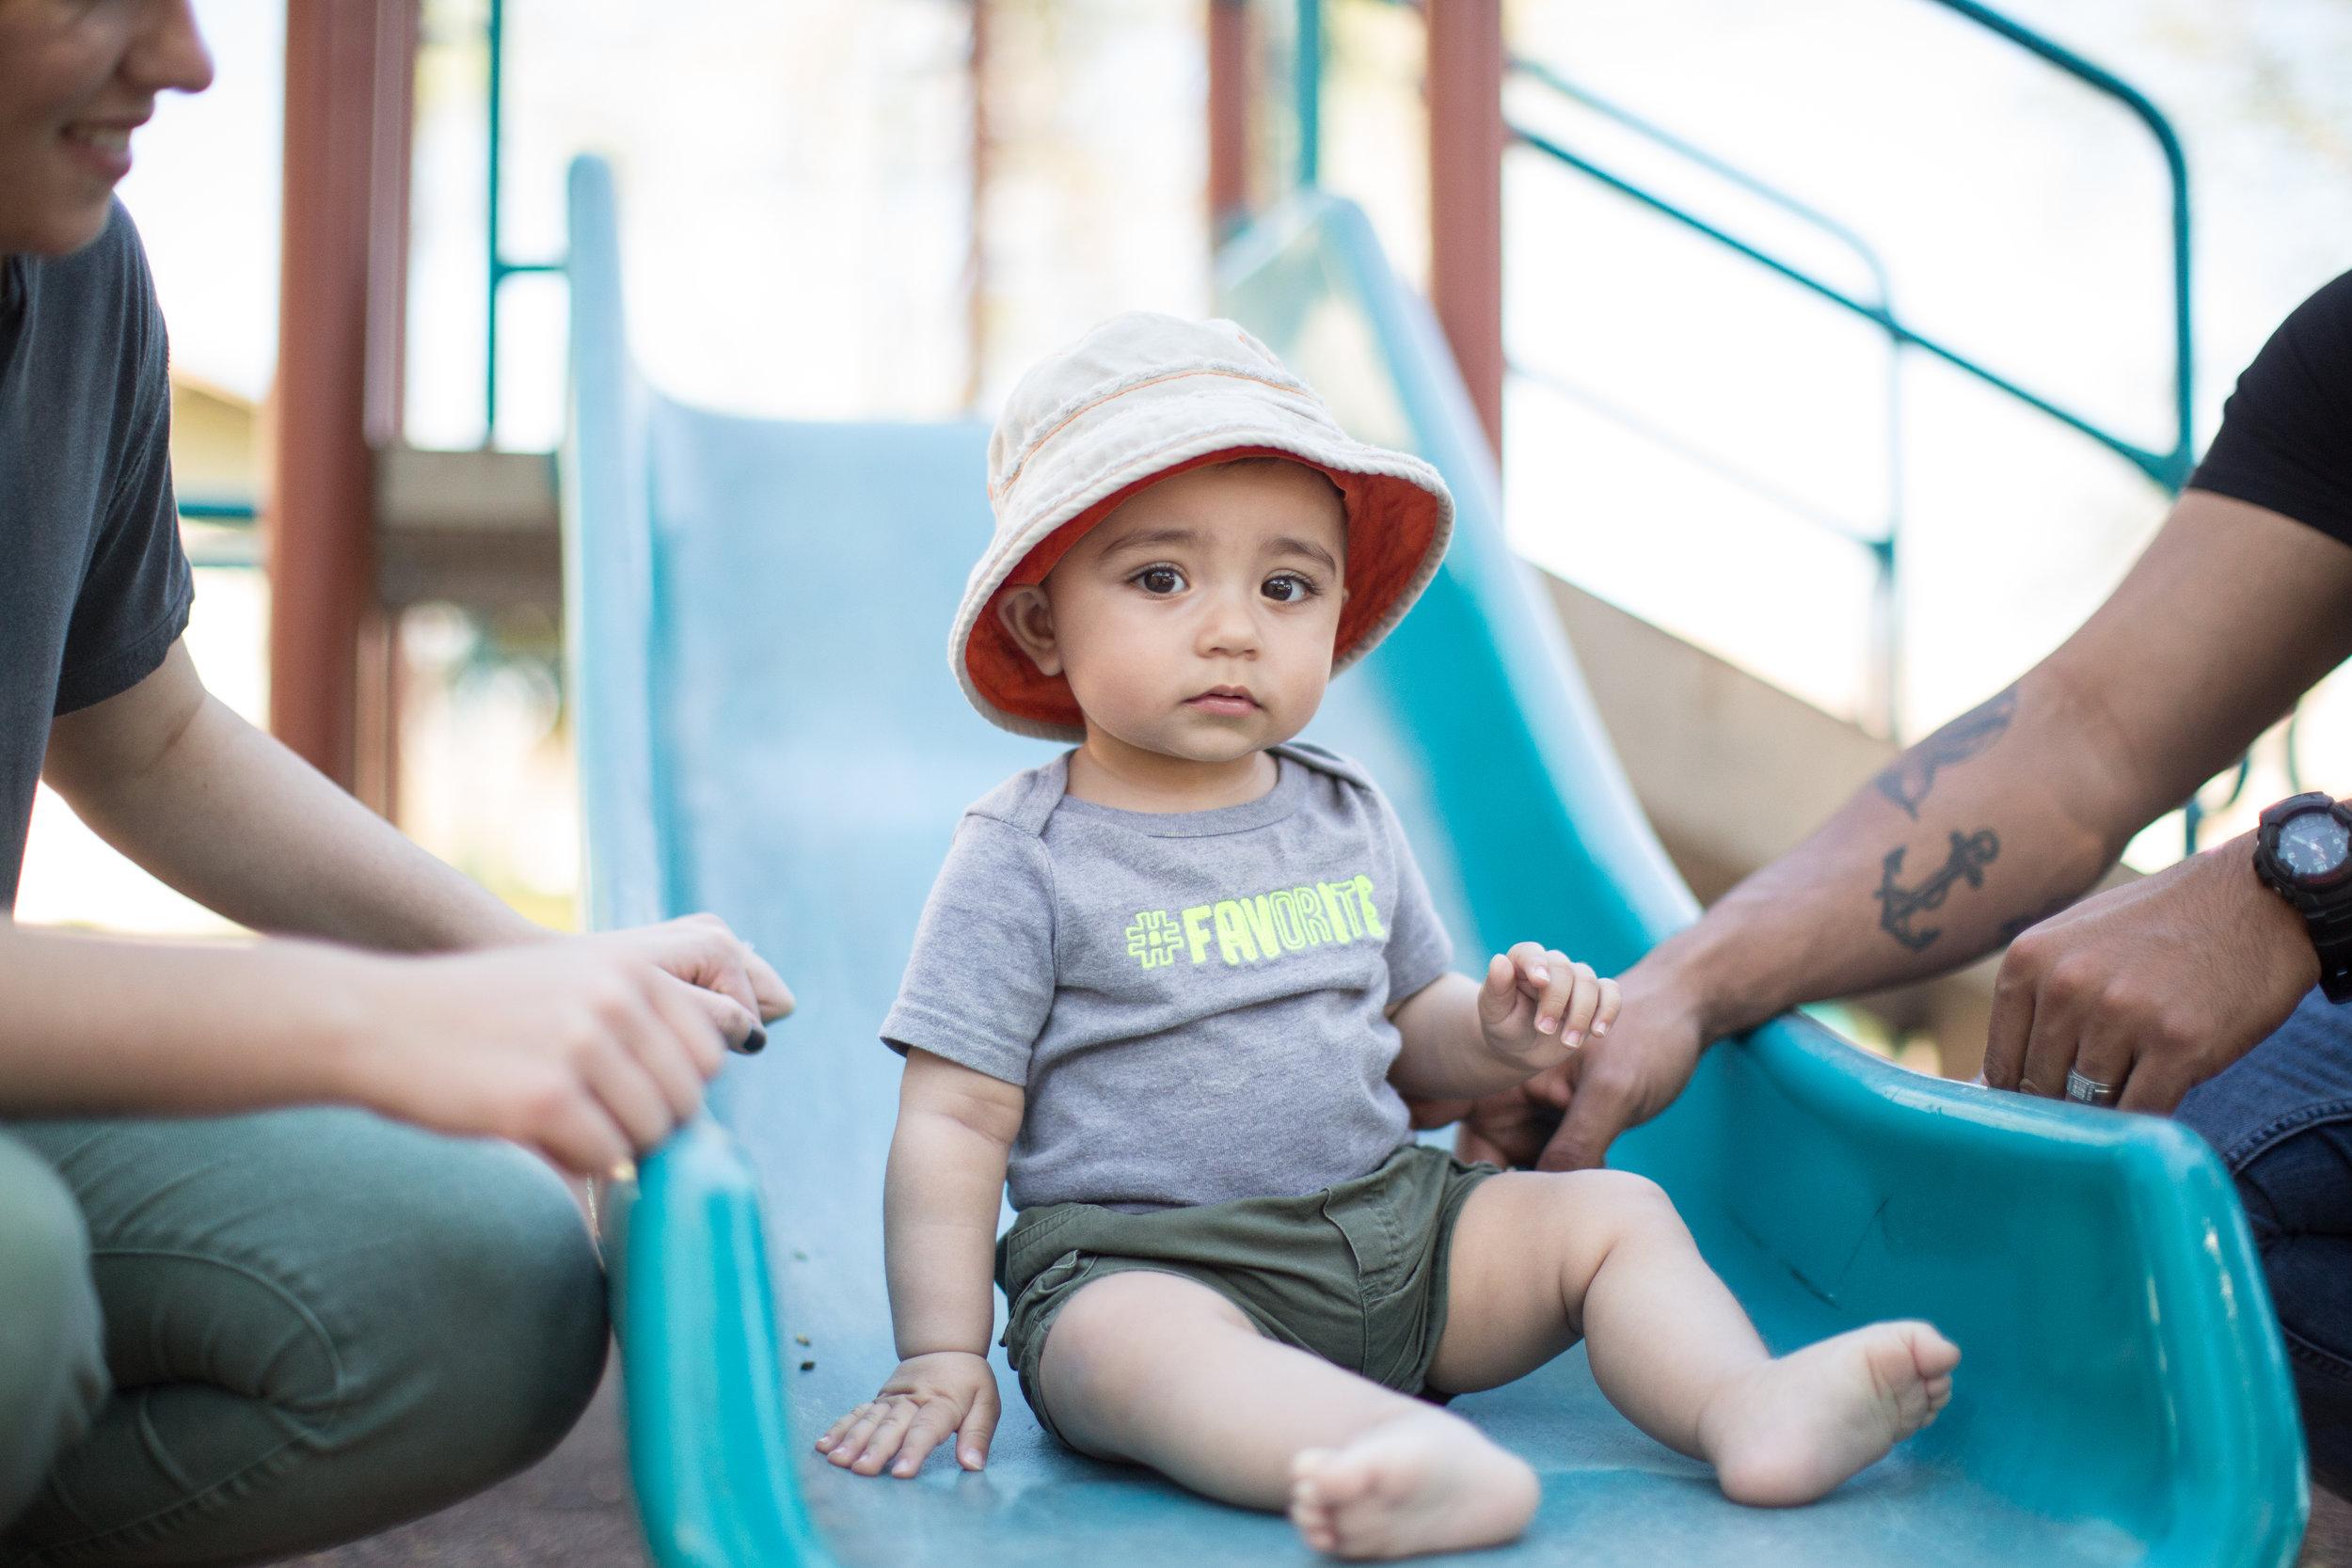 Litzinger Family Lifestyle - San Luis Obispo CA, March 11th 2017